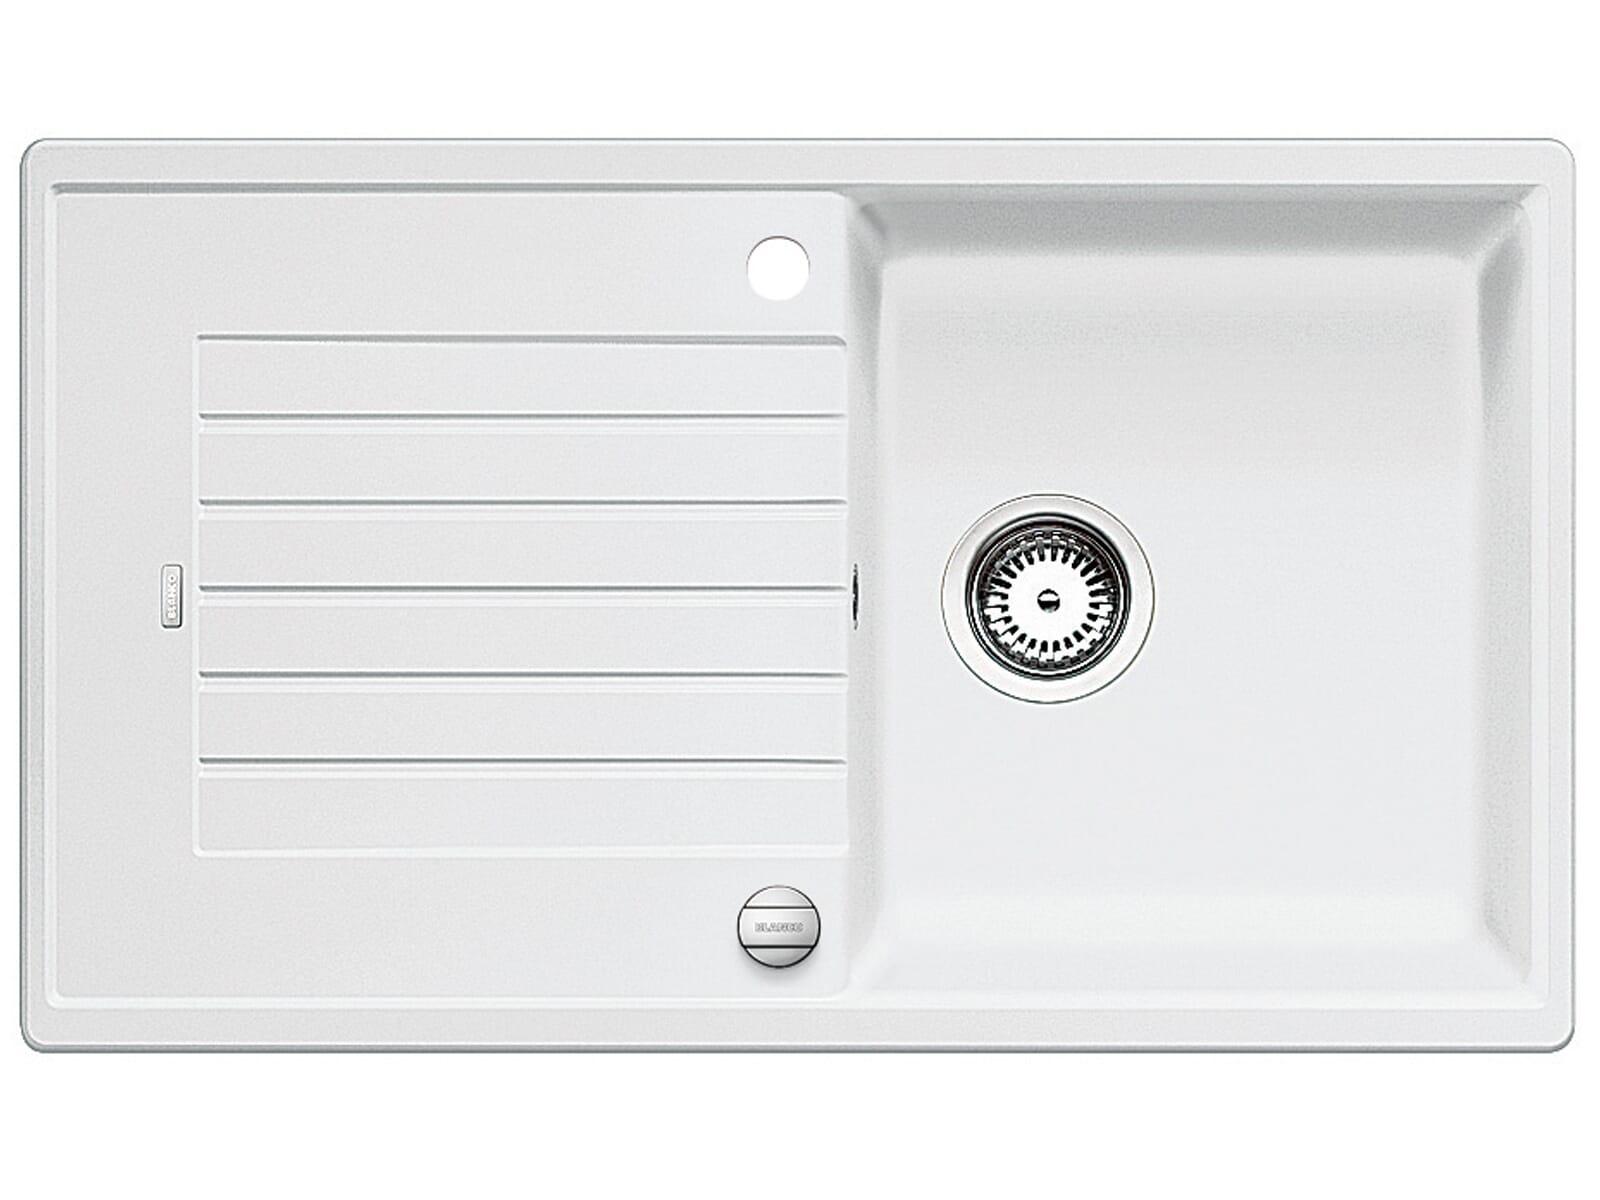 Blanco Zia 5 S Weiß - 520 506 Granitspüle